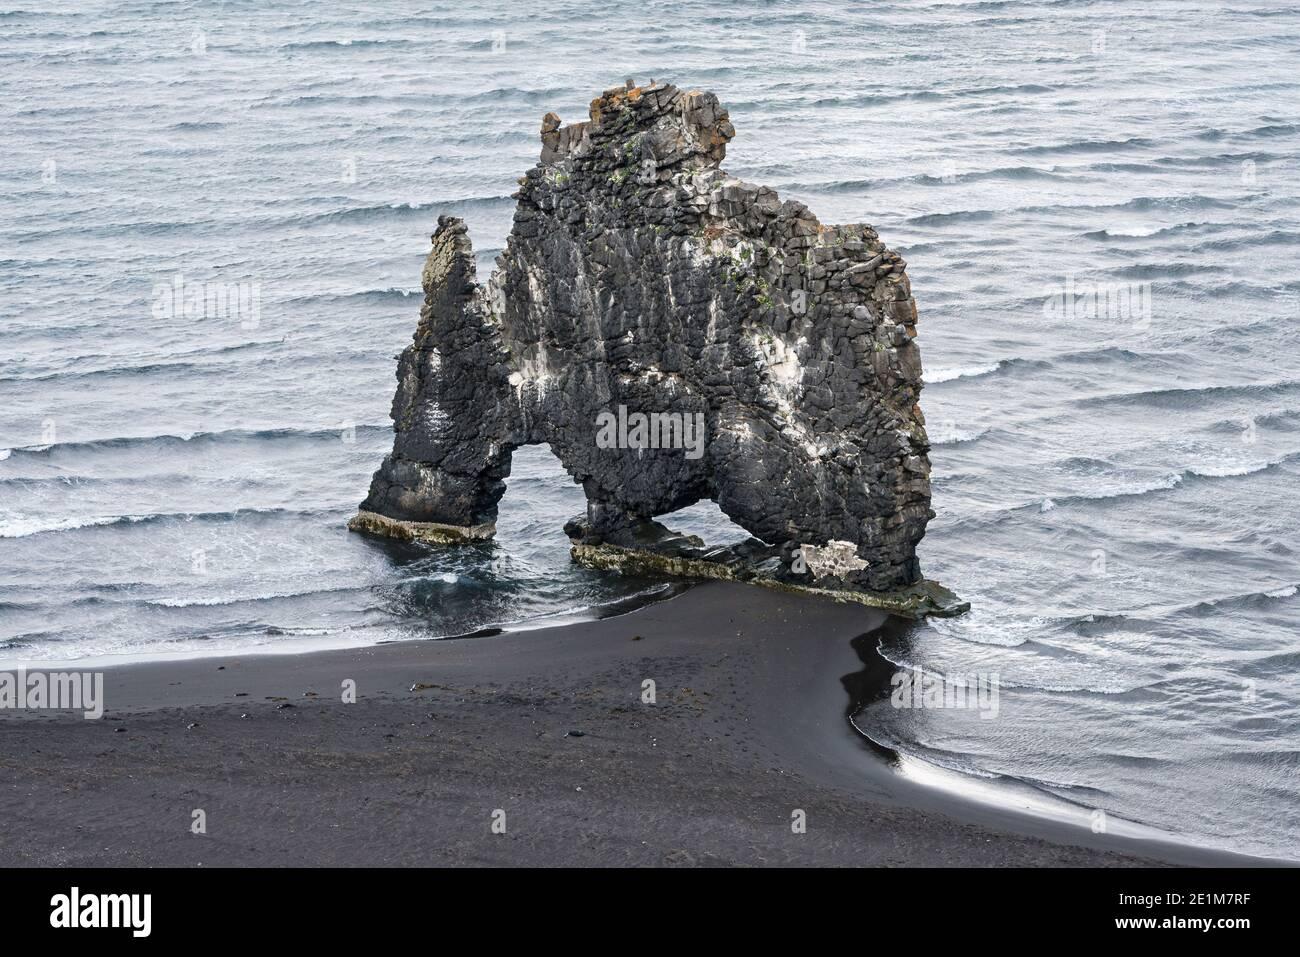 Hvítserkur, a 15m high basalt sea stack on the coast of the Vatnsnes peninsula (Iceland) shaped like a rhino, known as the Troll of Northwest Iceland Stock Photo